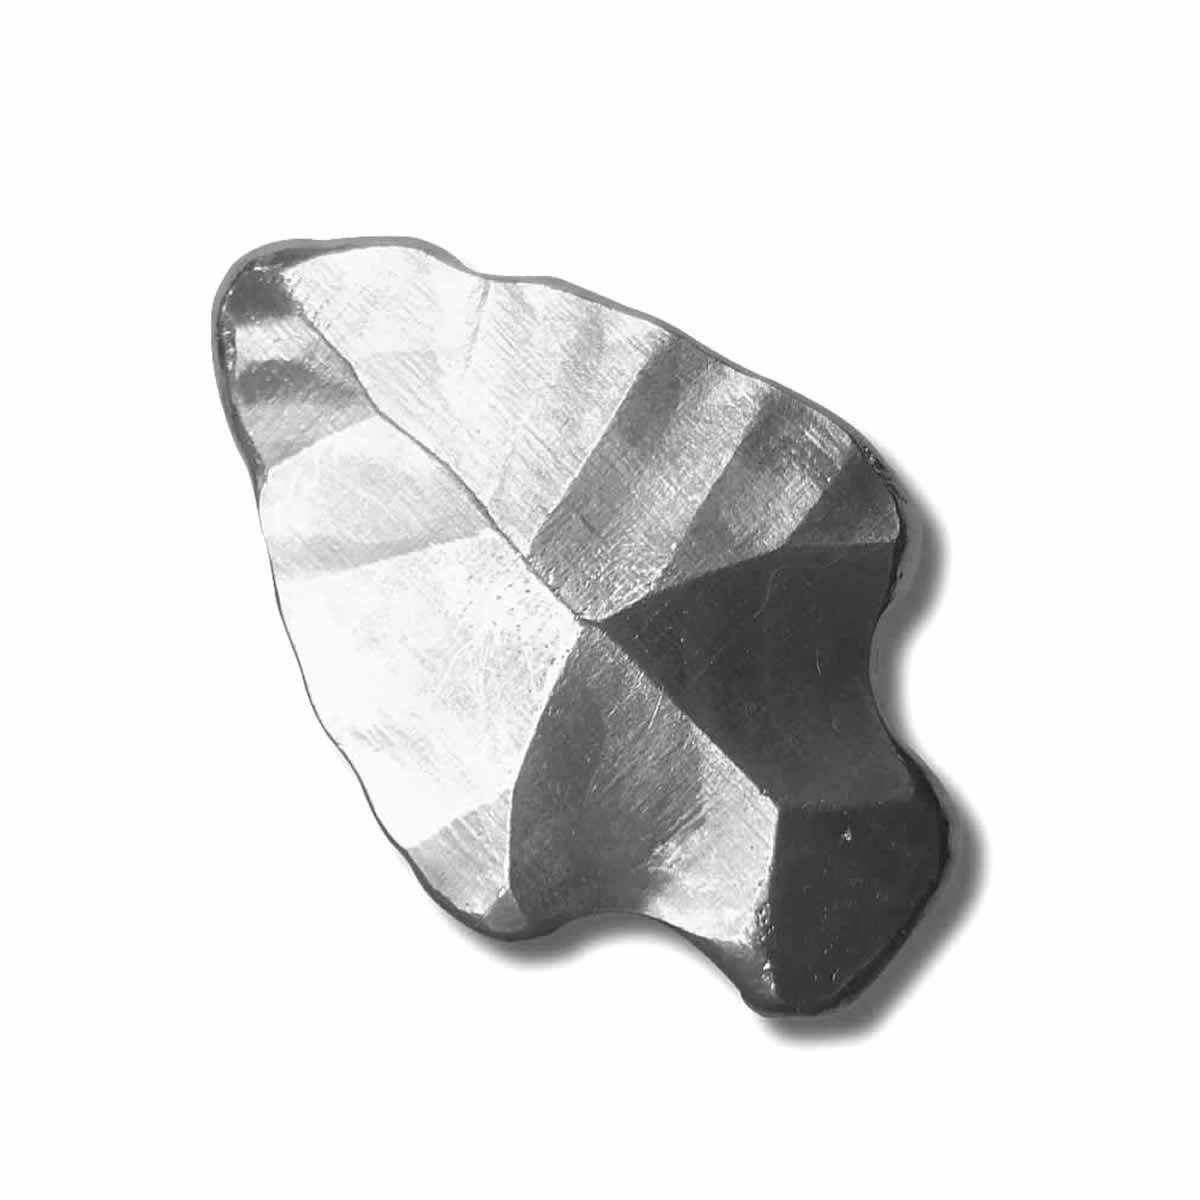 Arrowhead .999 Silver 1 oz Bar - Monarch Metals